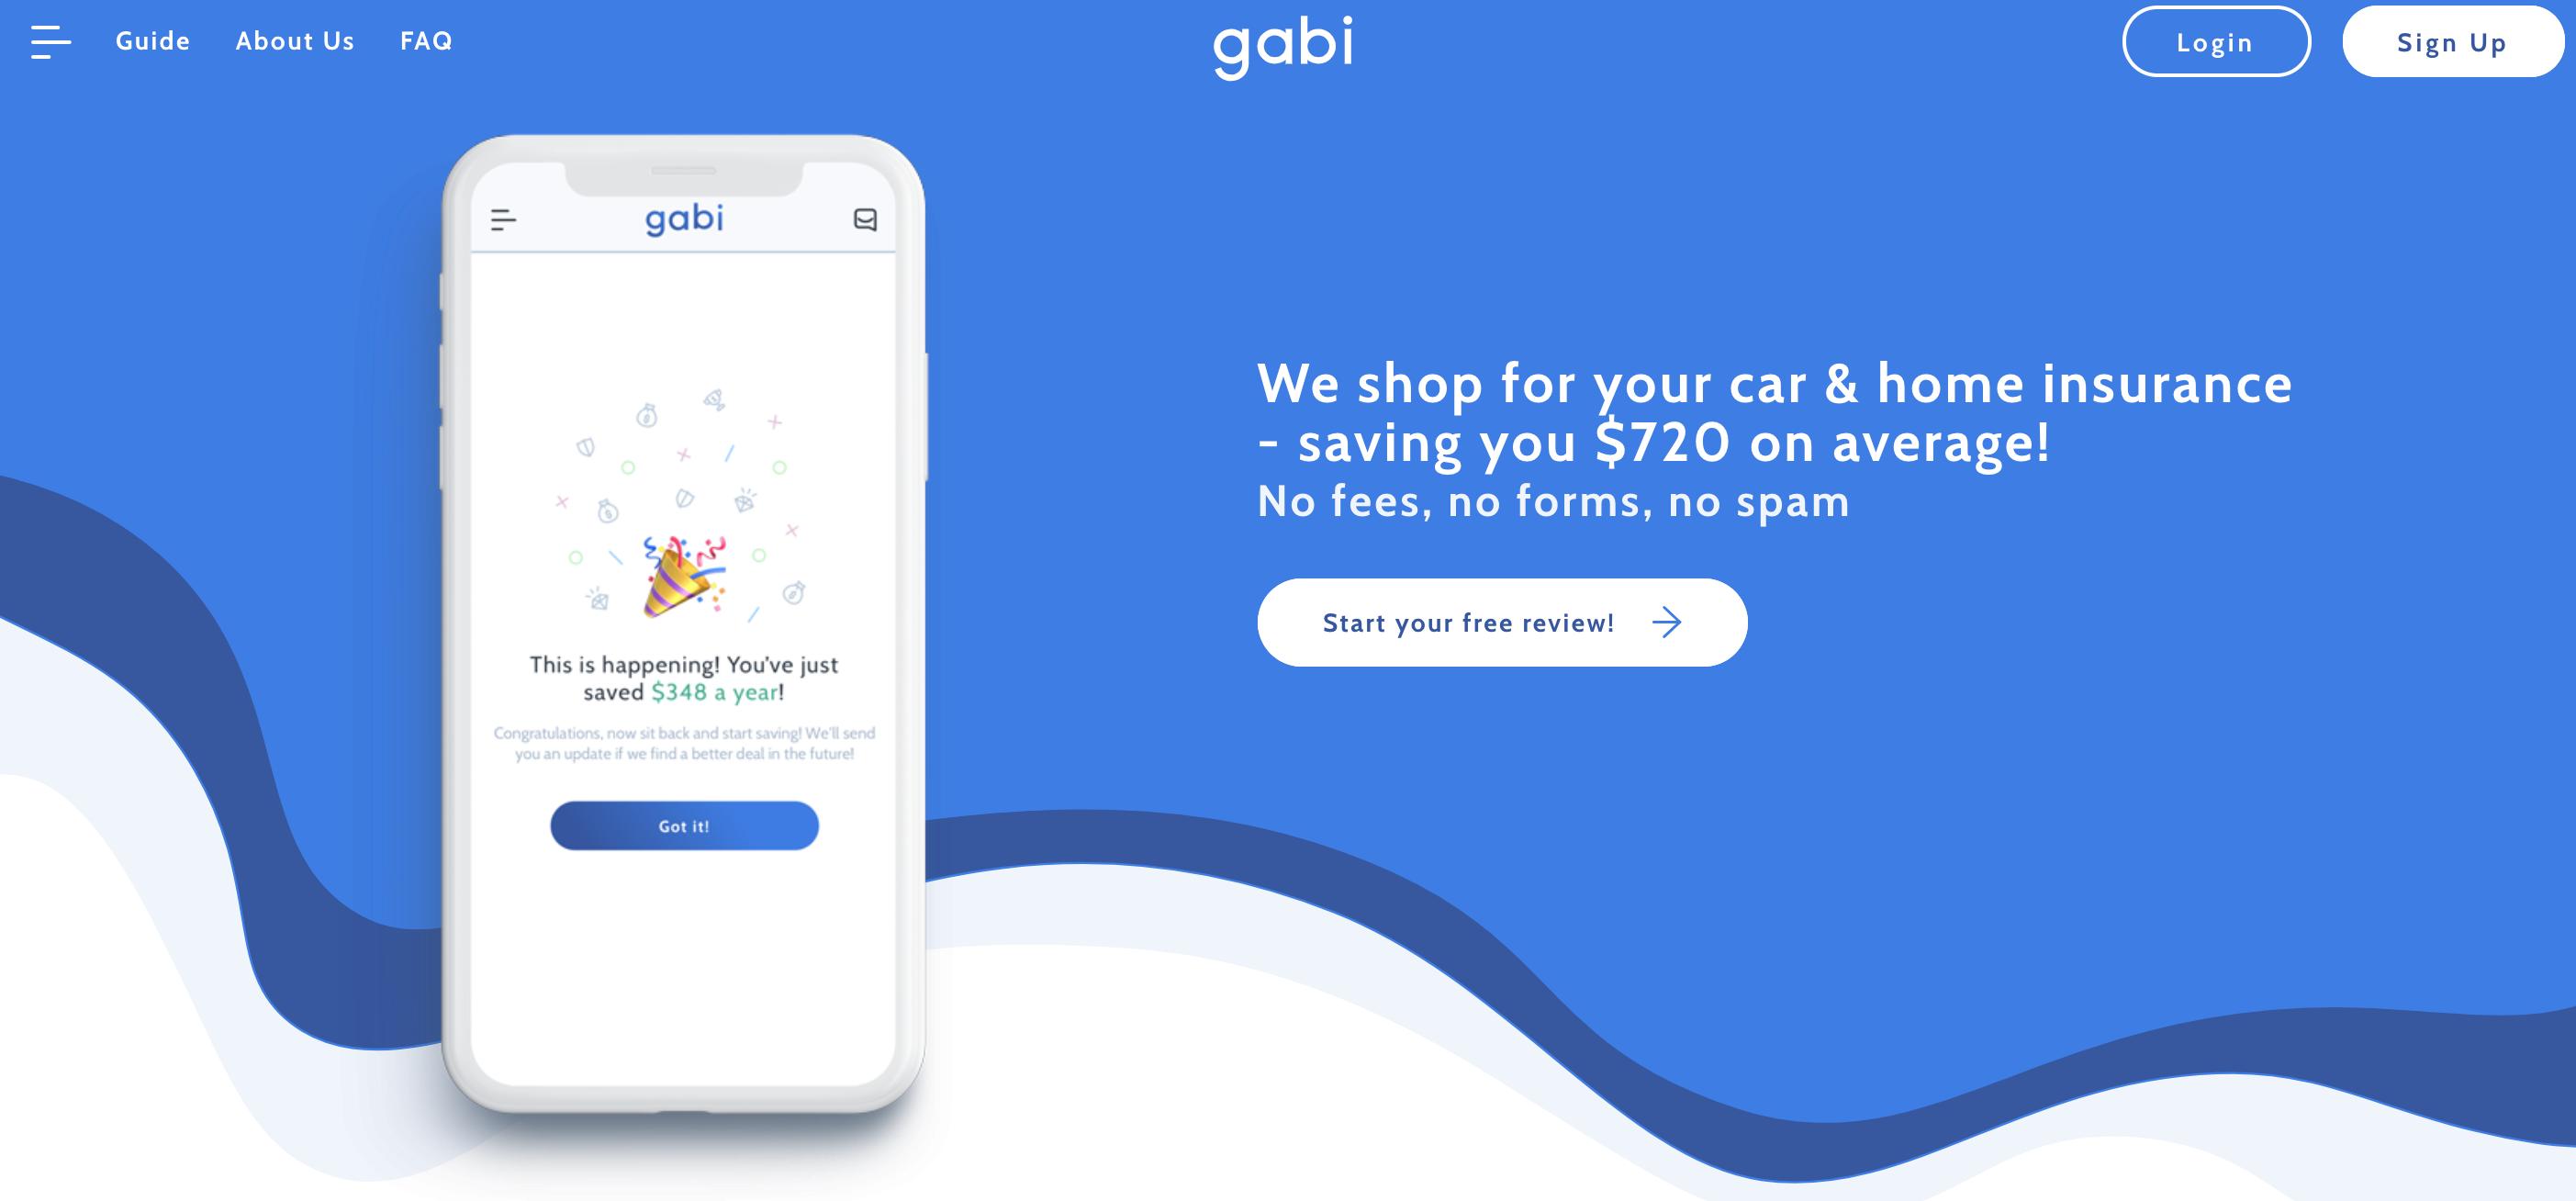 sign up for Gabi